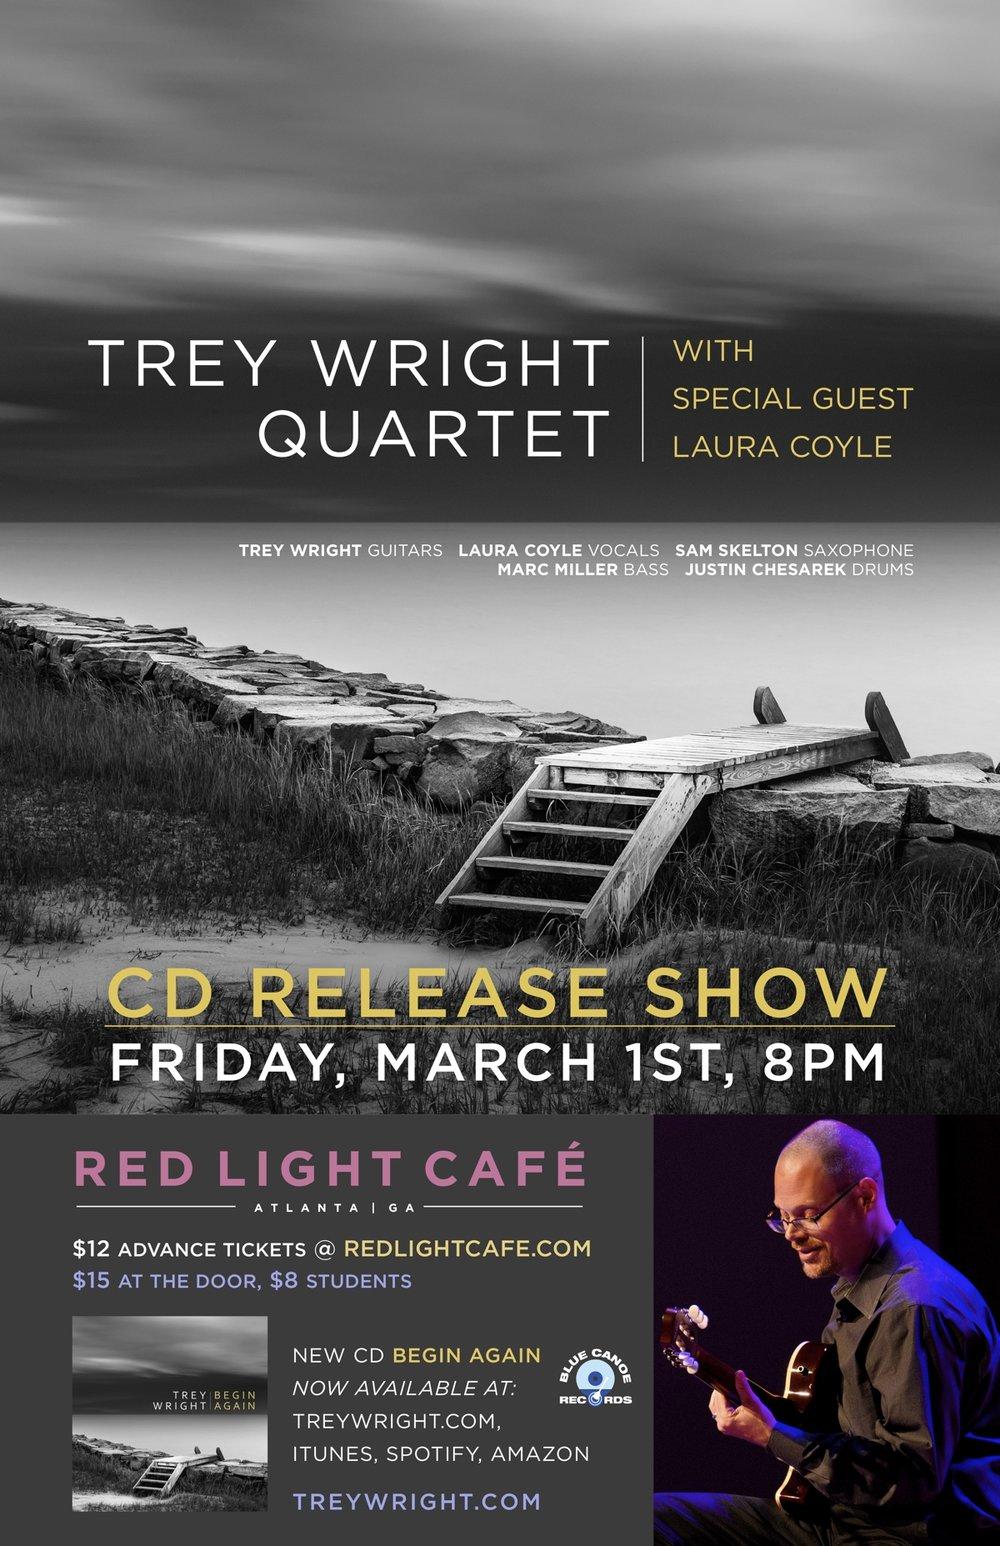 Trey Wright CD Release Show w/ special guest Laura Coyle — March 1, 2019 — Red Light Café, Atlanta, GA